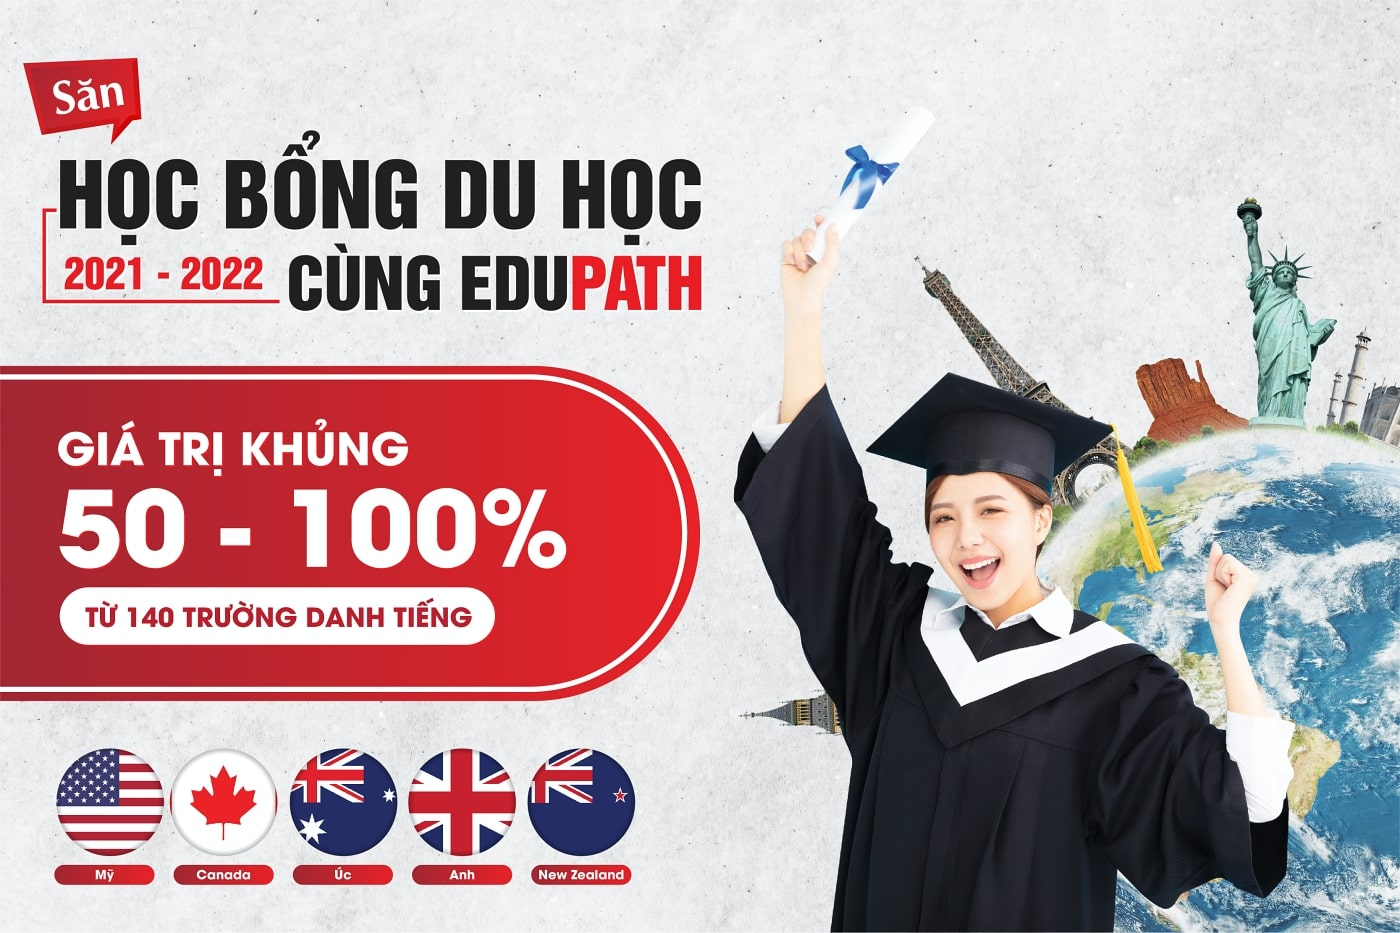 Học bổng du học EduPath